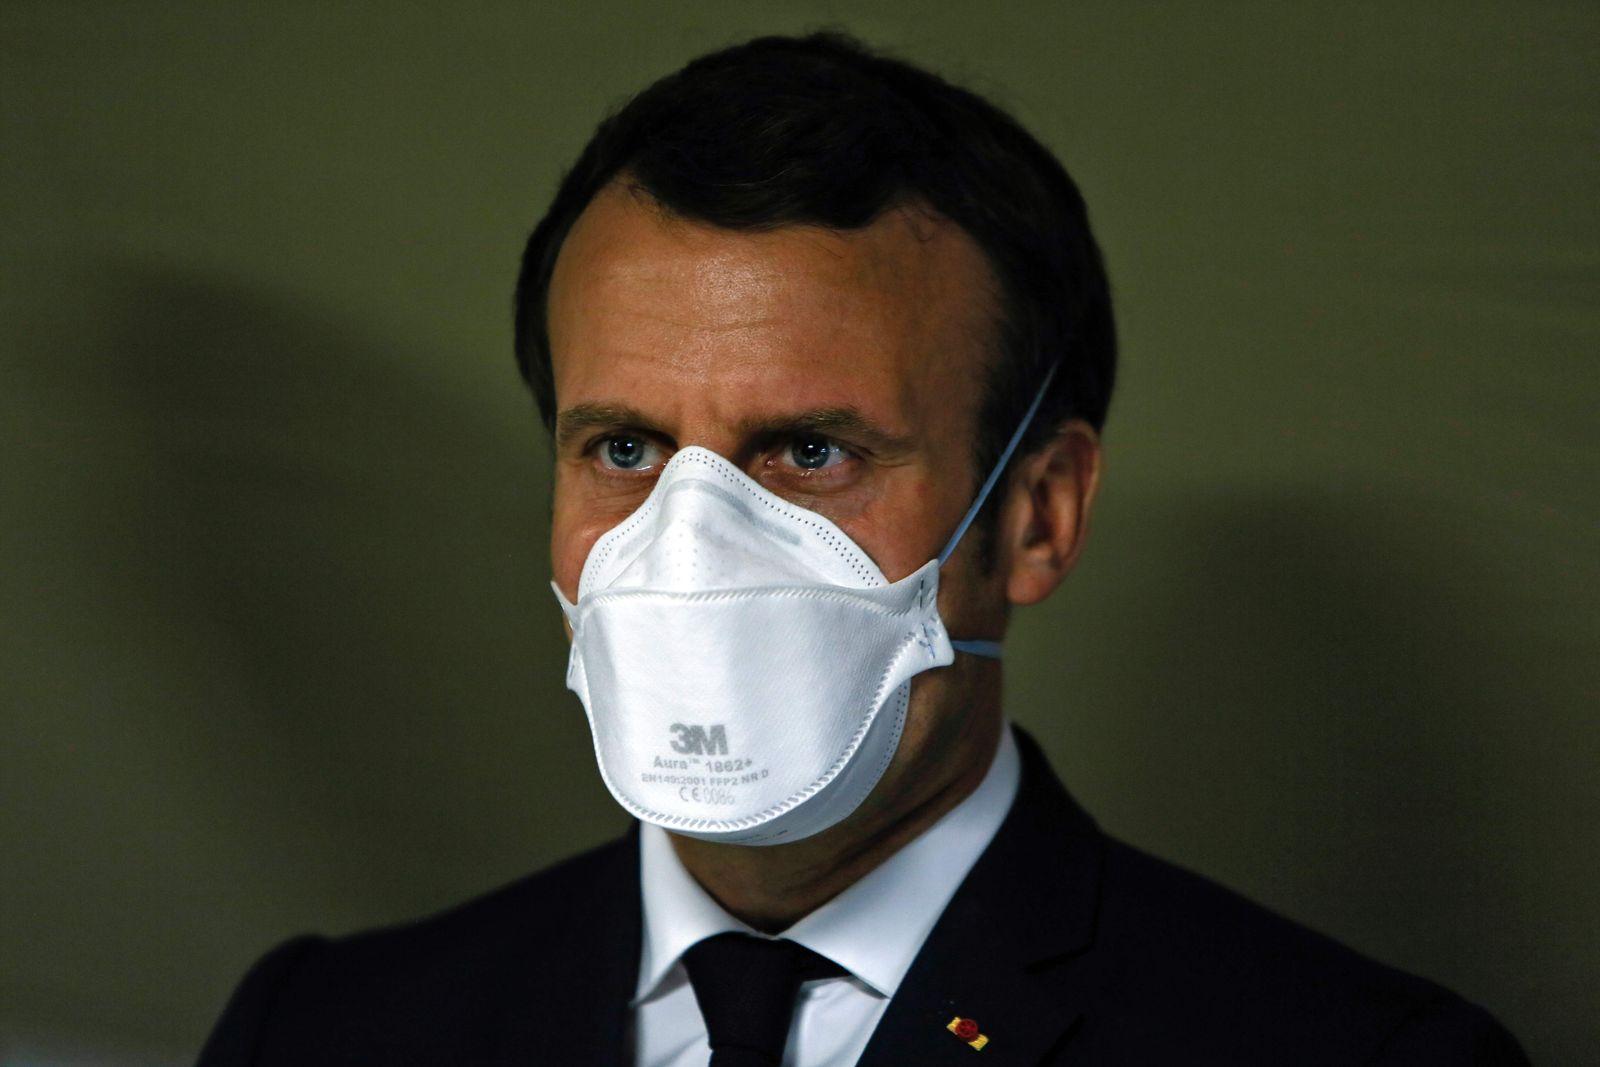 Emmanuel Macron / Coronavirus / Schutzmaske